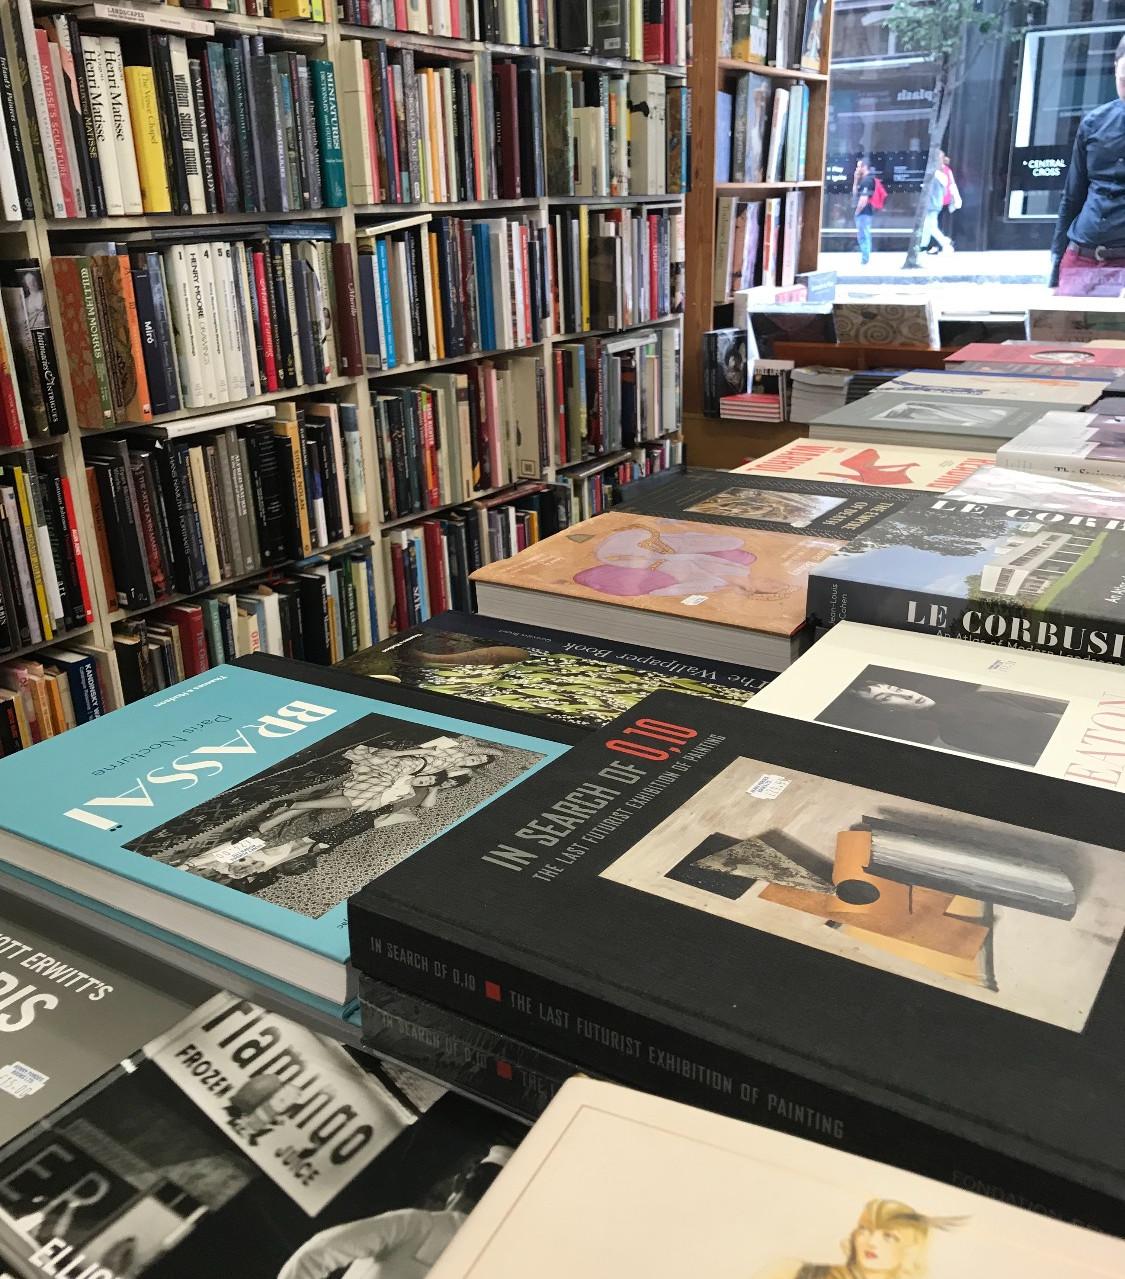 bookstores are amazing